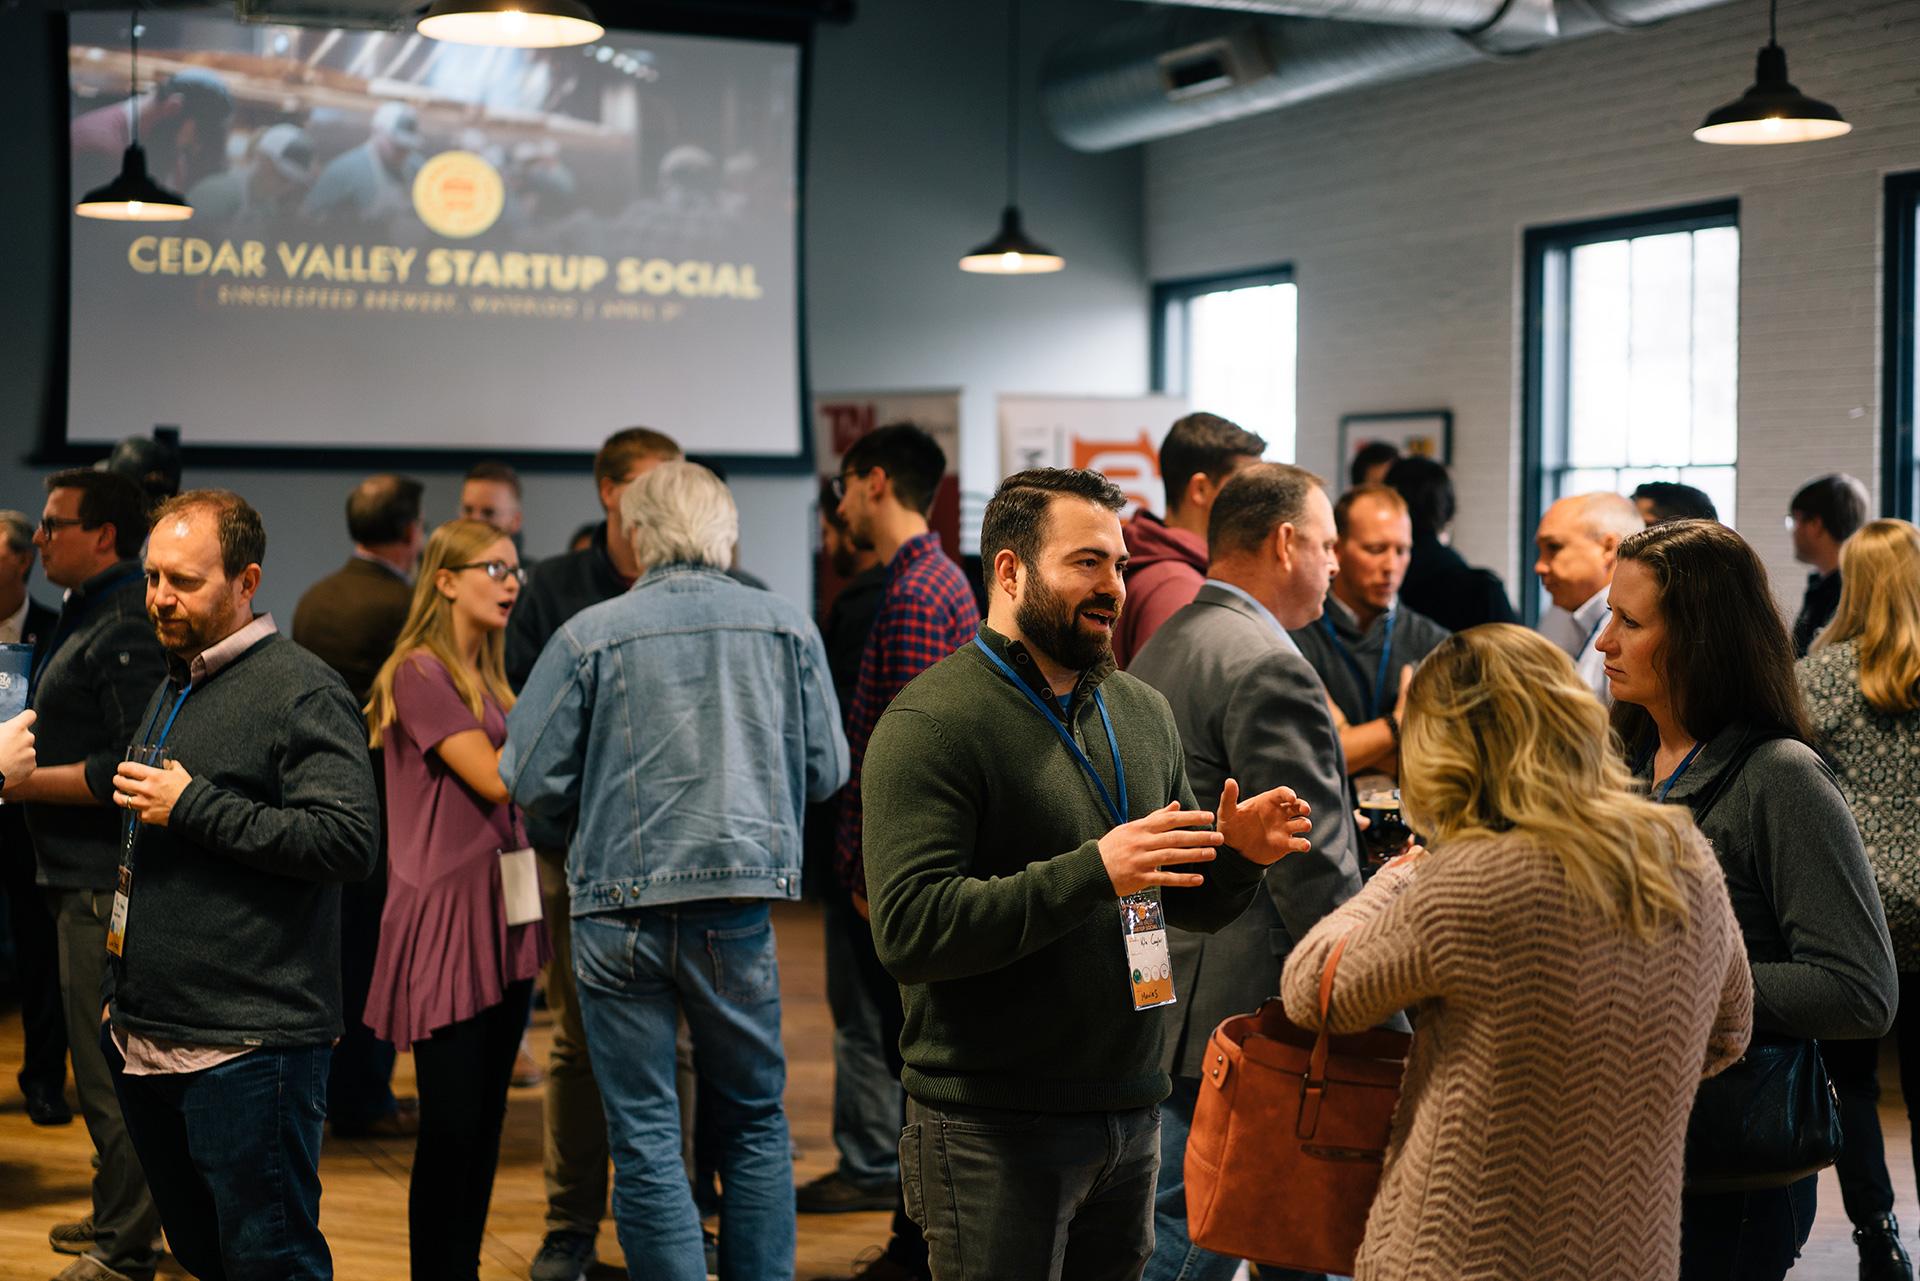 Cedar Valley Startup Week Social.jpg